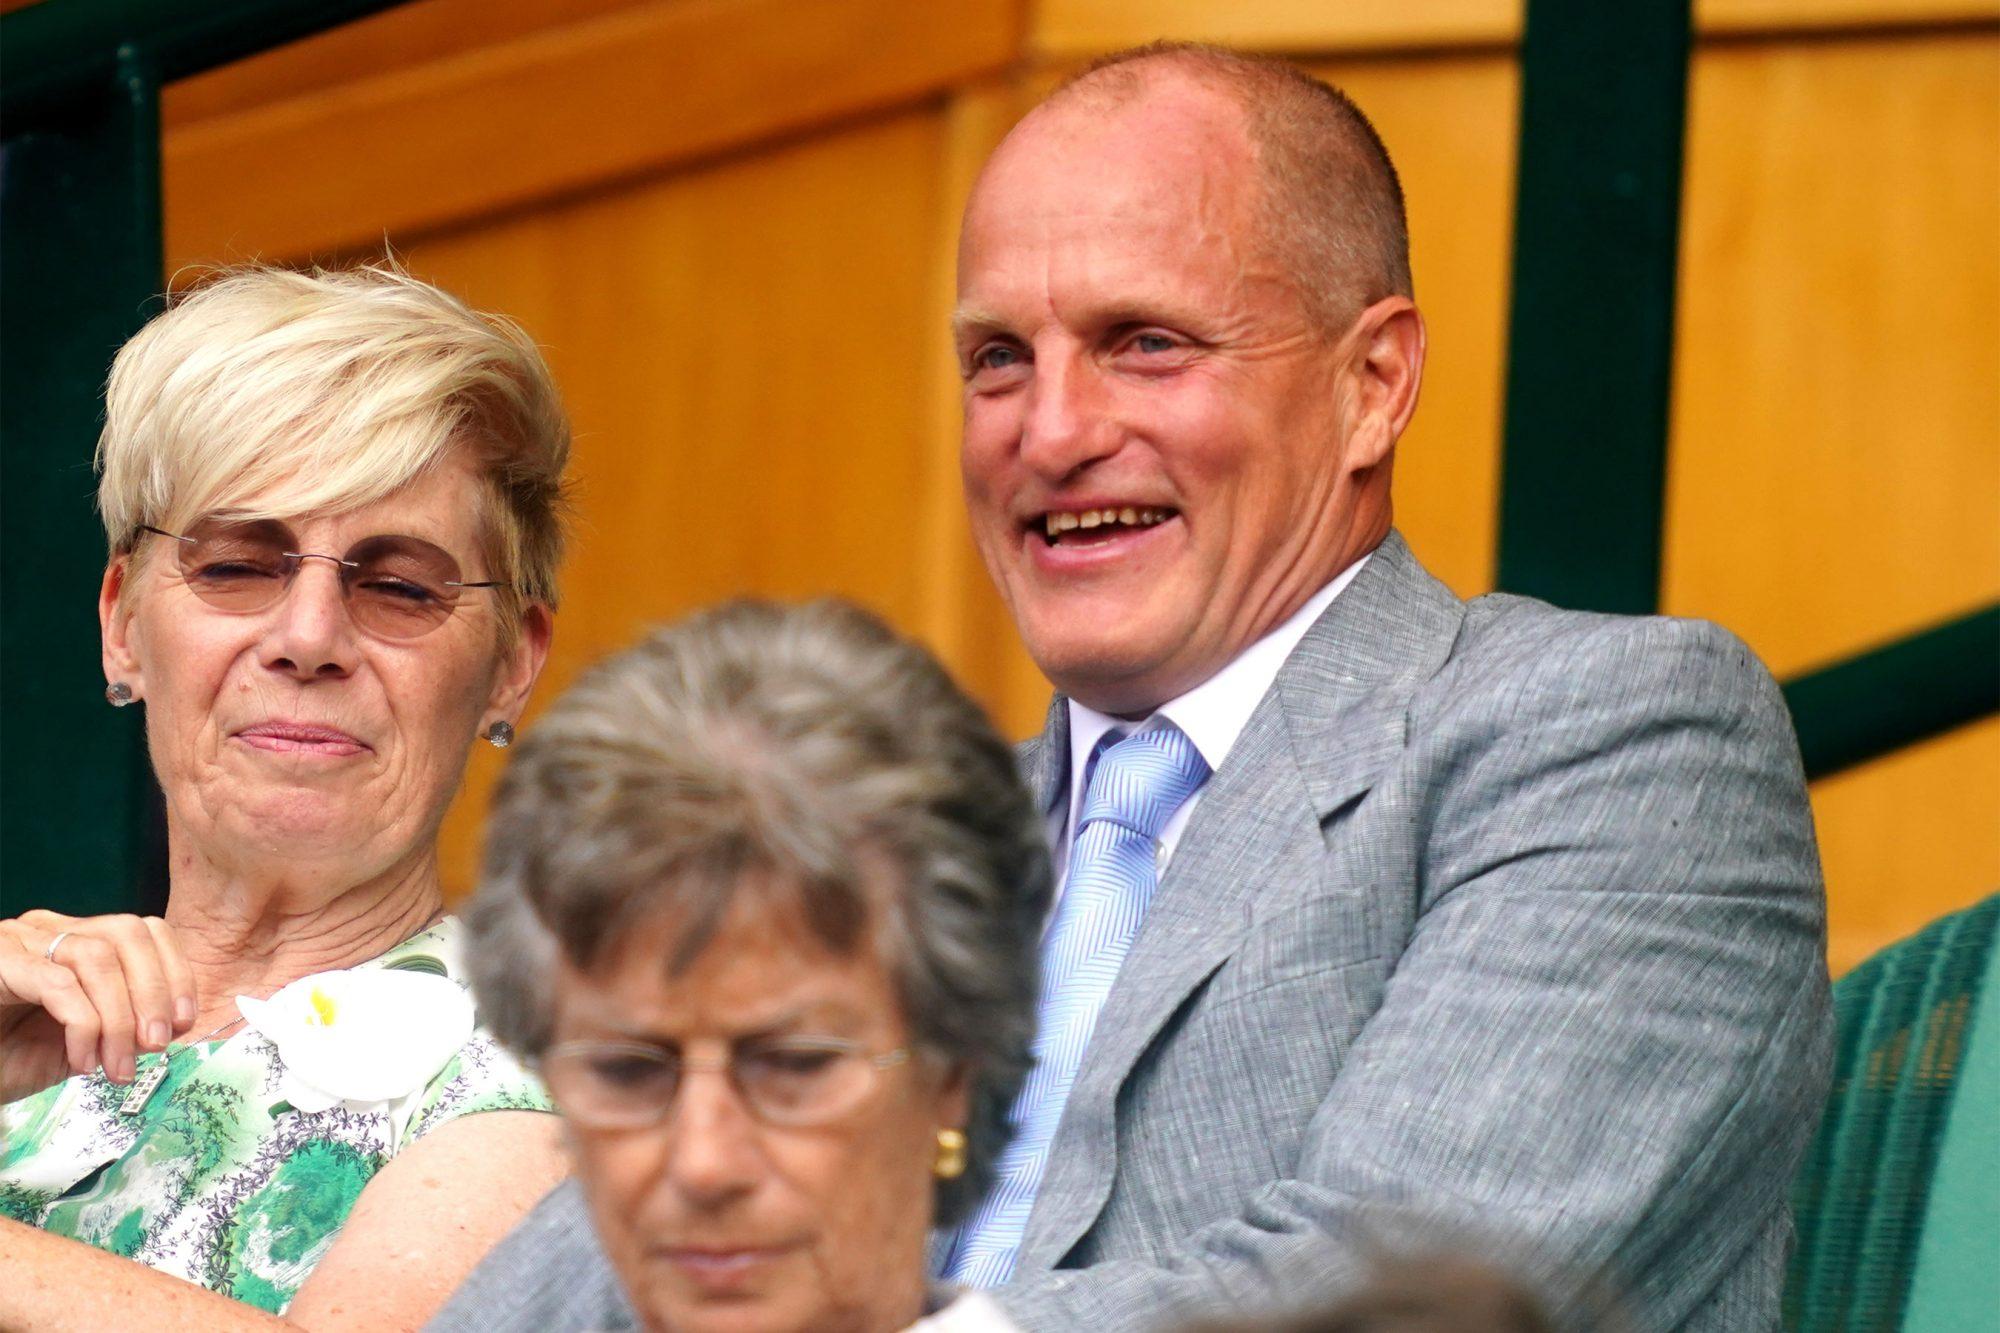 Woody Harrelson at the Wimbledon Championships